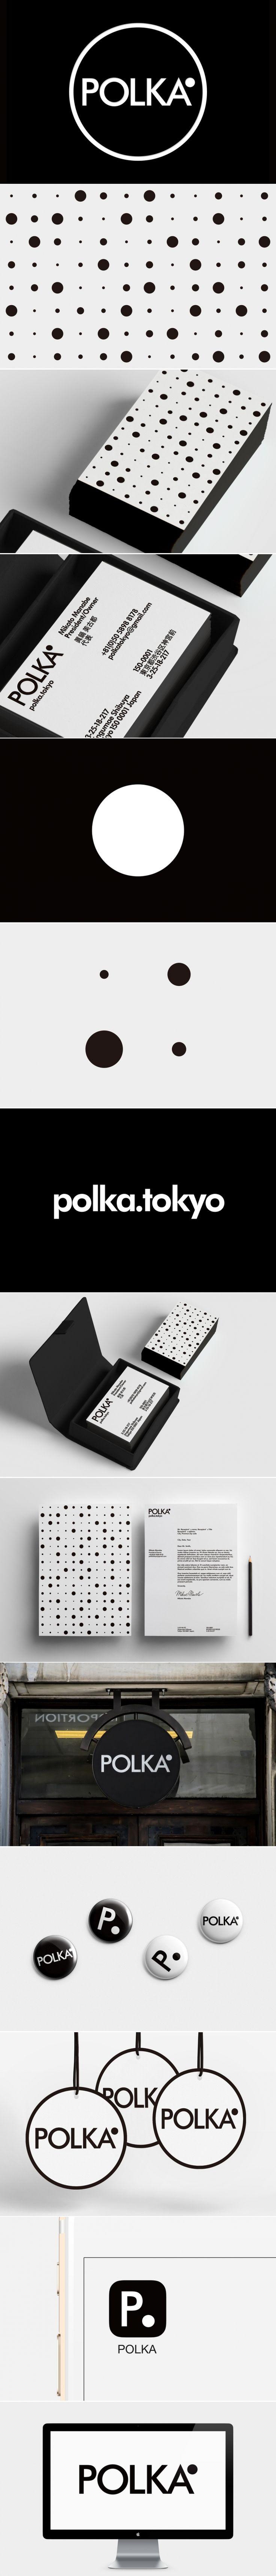 Polka — The Dieline - Branding & Packaging Design - created via https://pinthemall.net